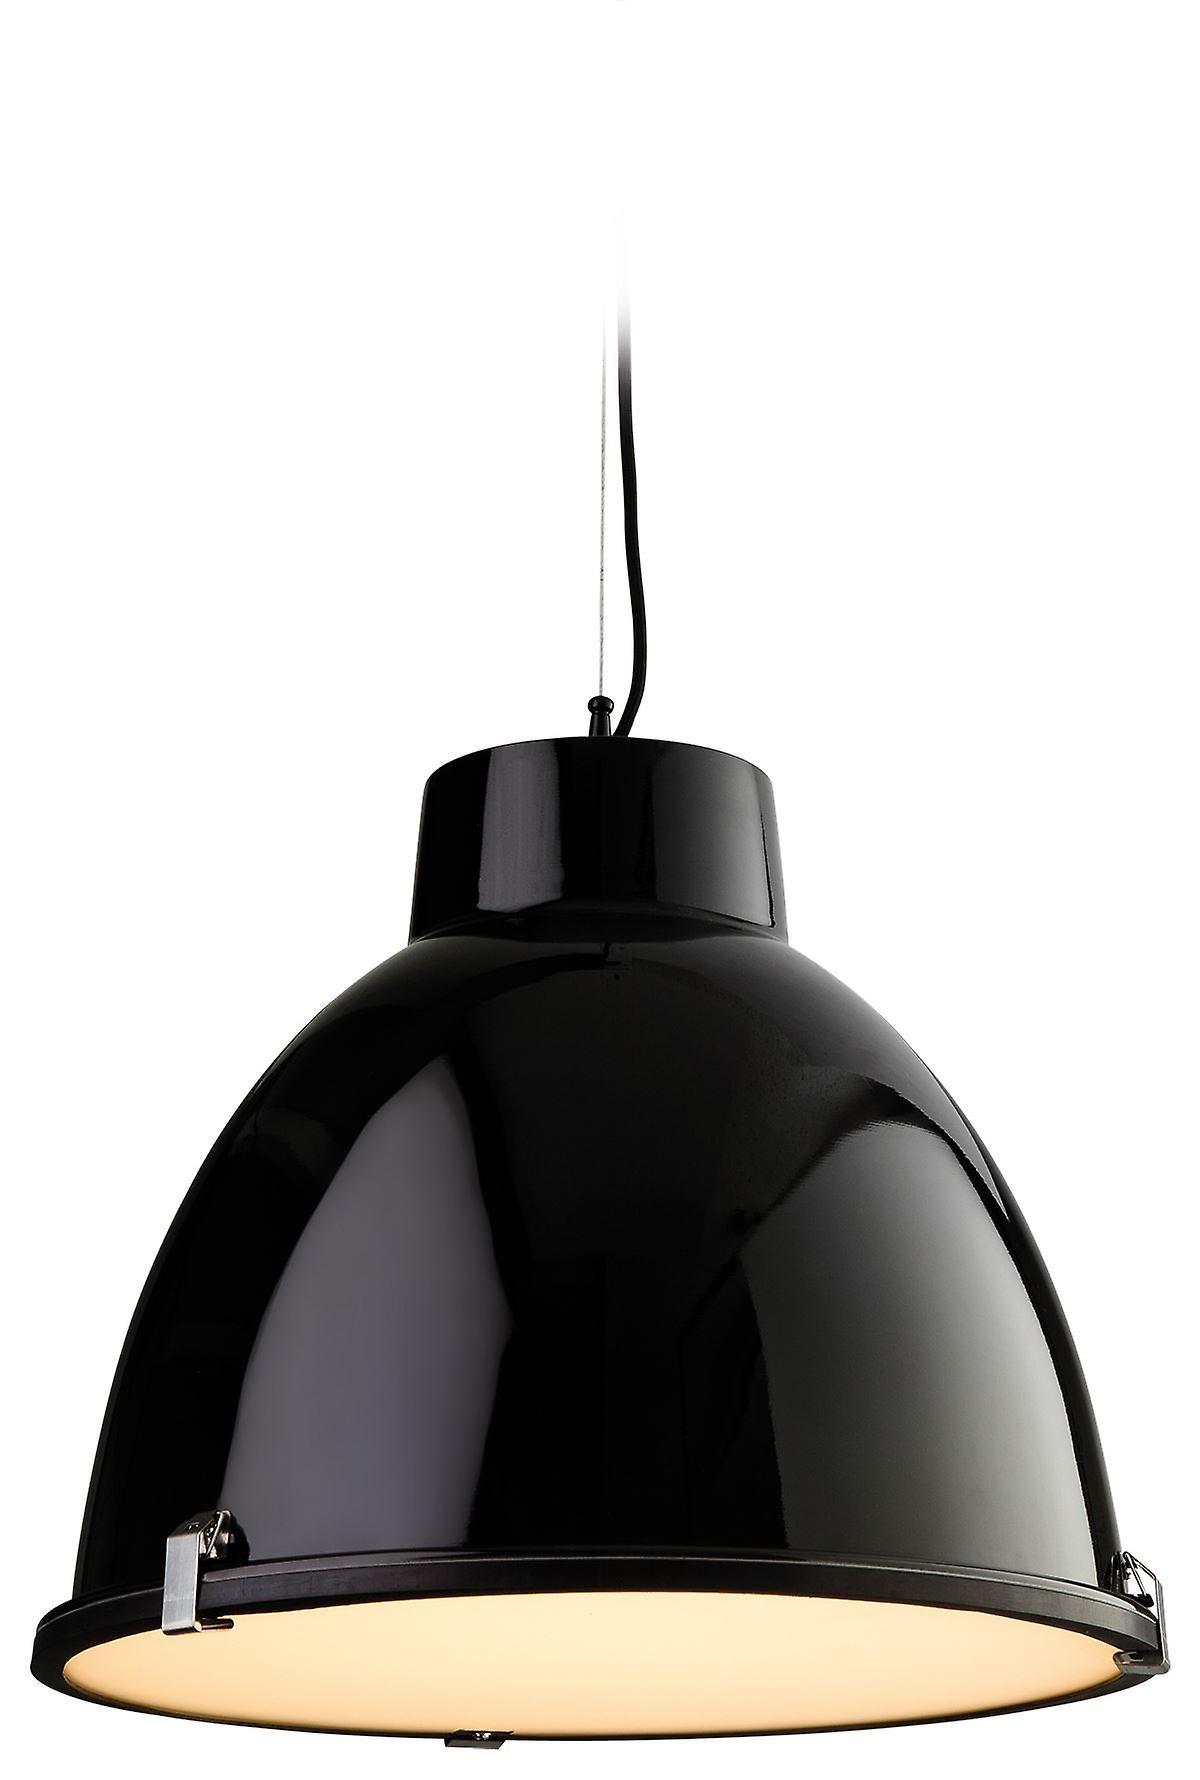 Firstlumière - 1 lumière Ceiling pendentif noir, Frosted Glass - 8621BK